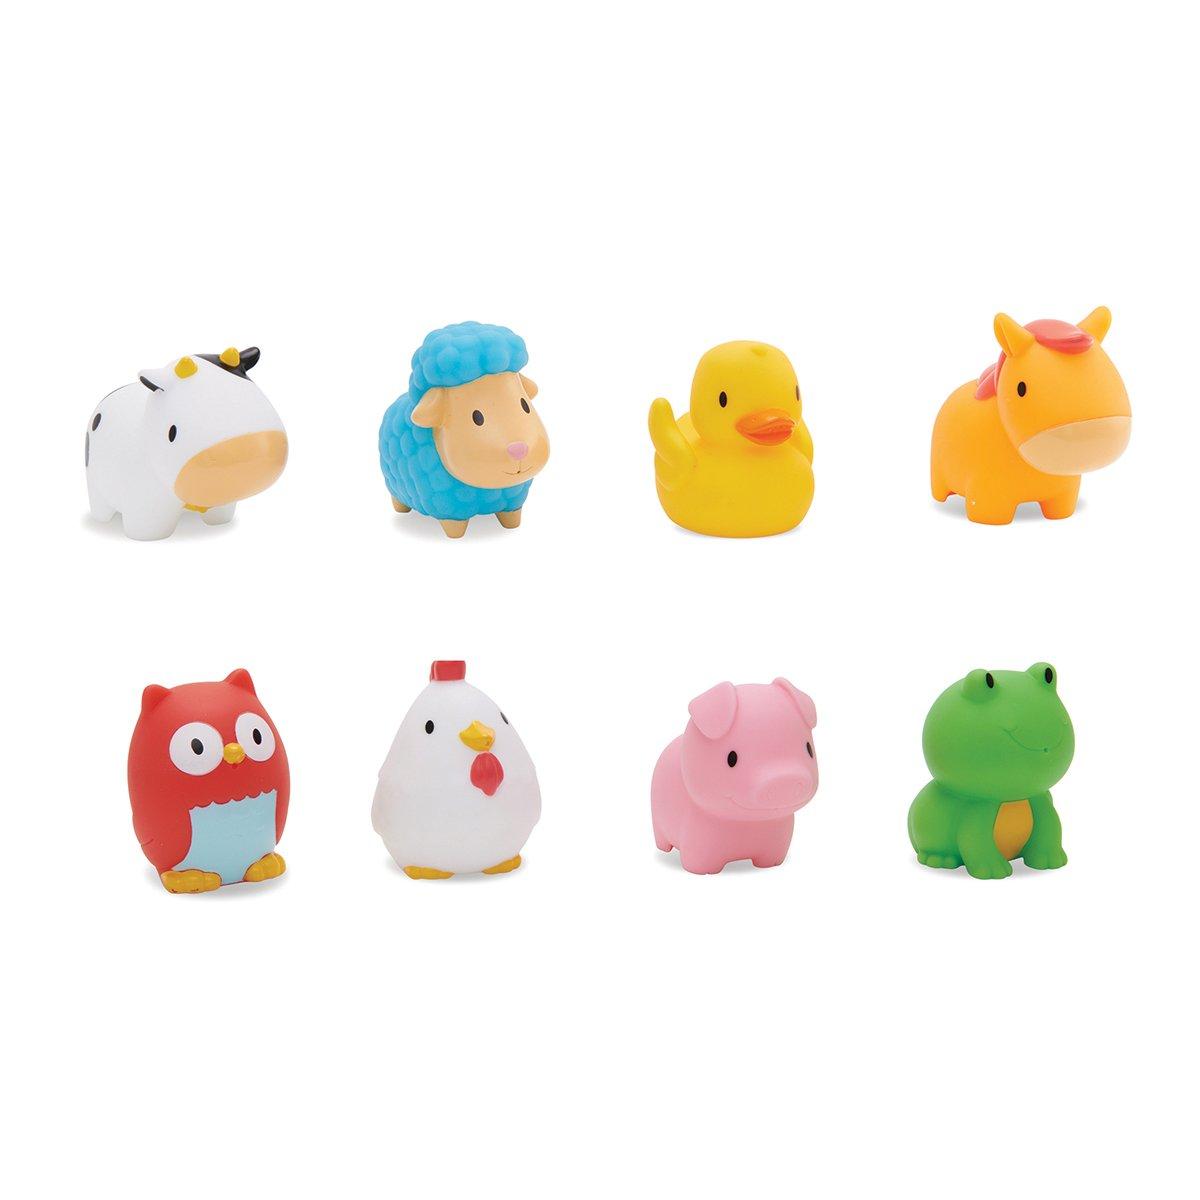 Munchkin Animalitos flotantes de granja lanzachorros (pack de 8) product image